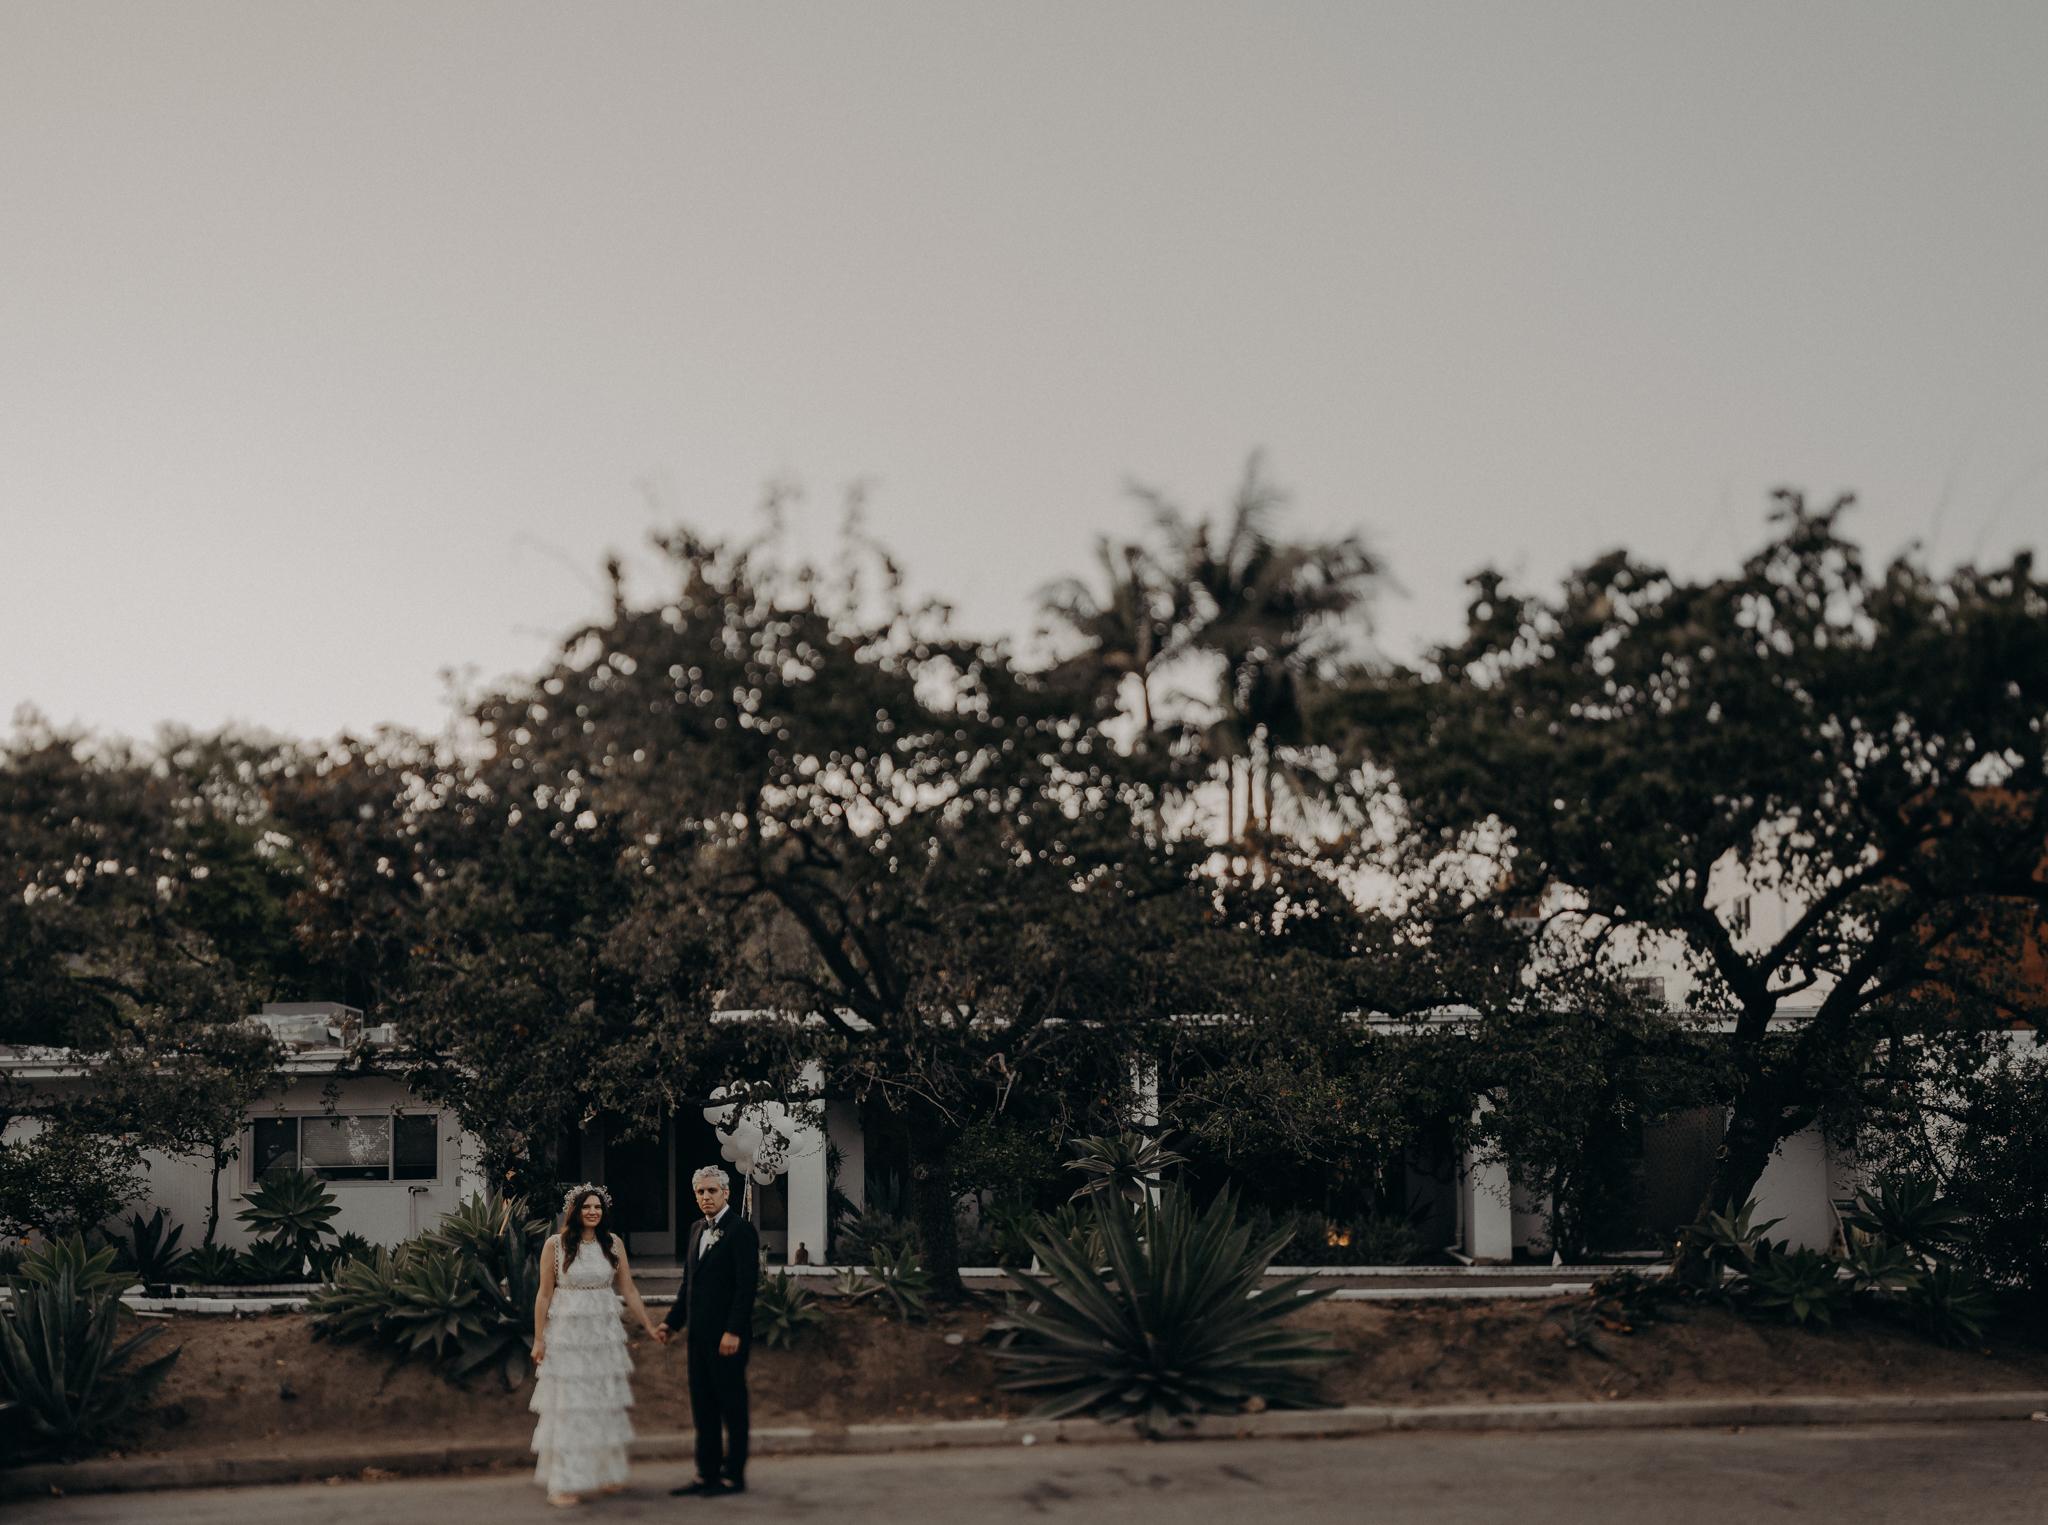 Isaiah + Taylor Photography - Private Estate Backyard Wedding - Beverly Hills - Los Angeles Wedding Photographer - 108.jpg